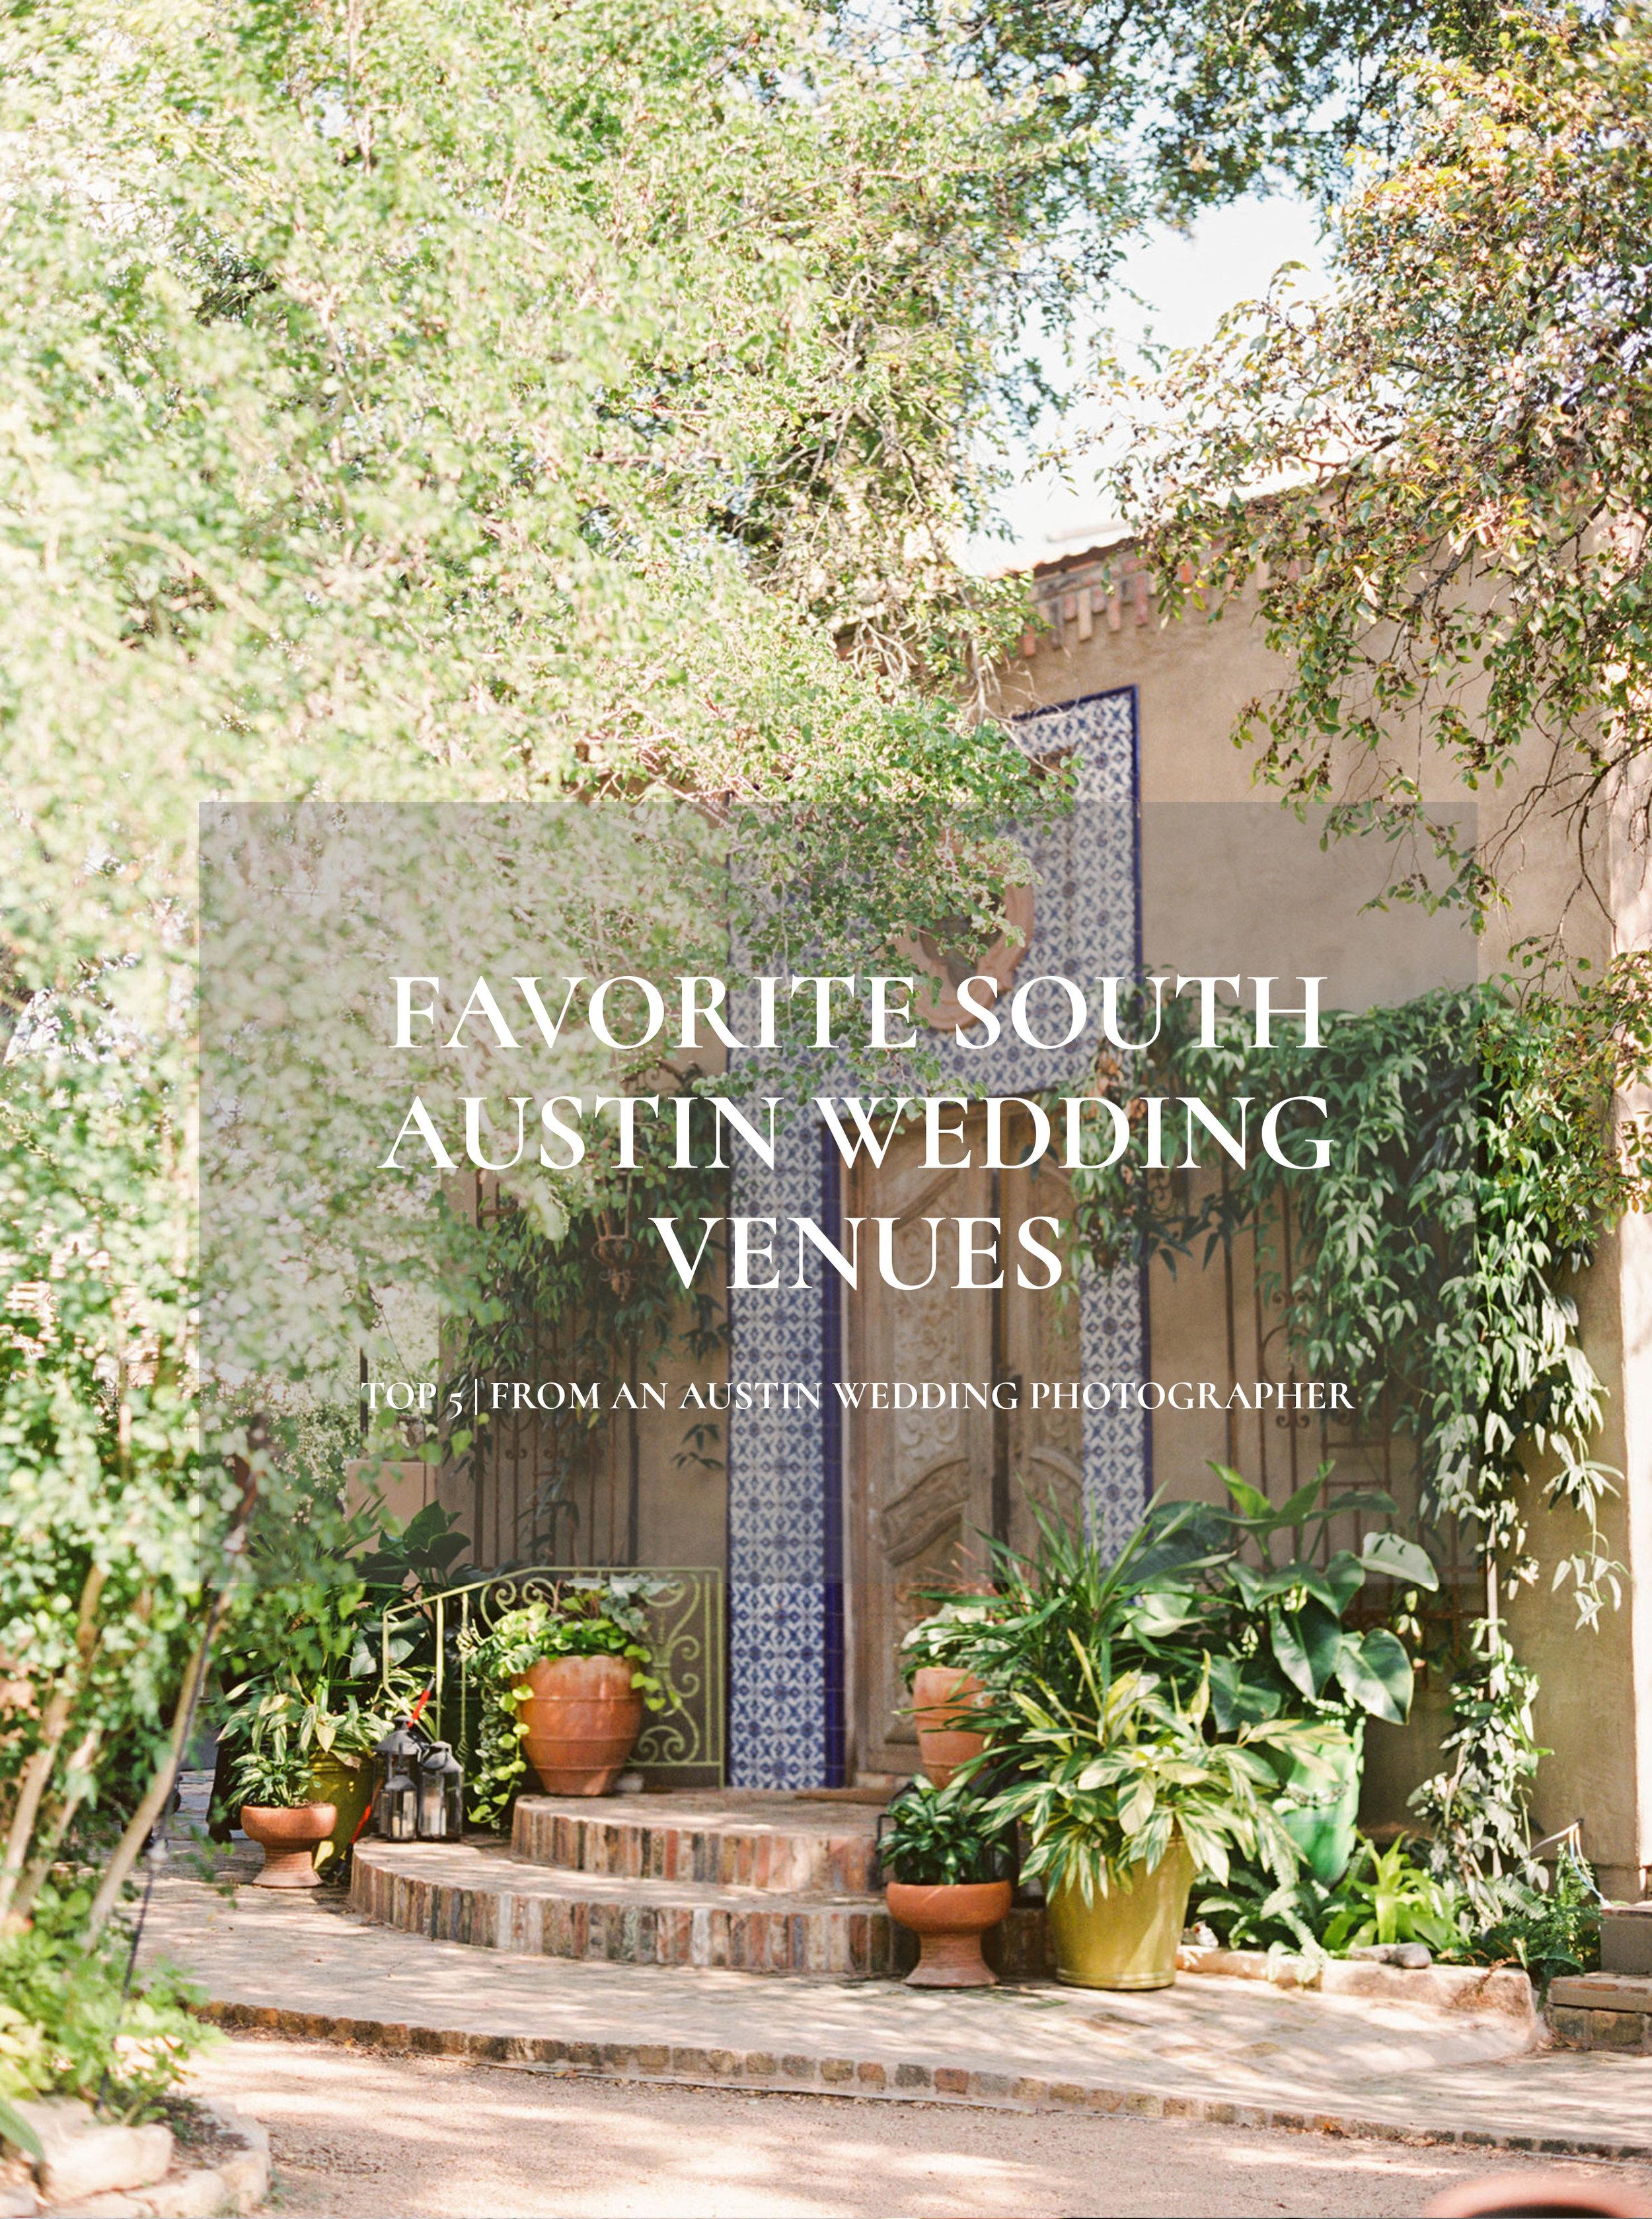 Austin Wedding Venues.Austin Wedding Photographer Favorite South Austin Wedding Venues